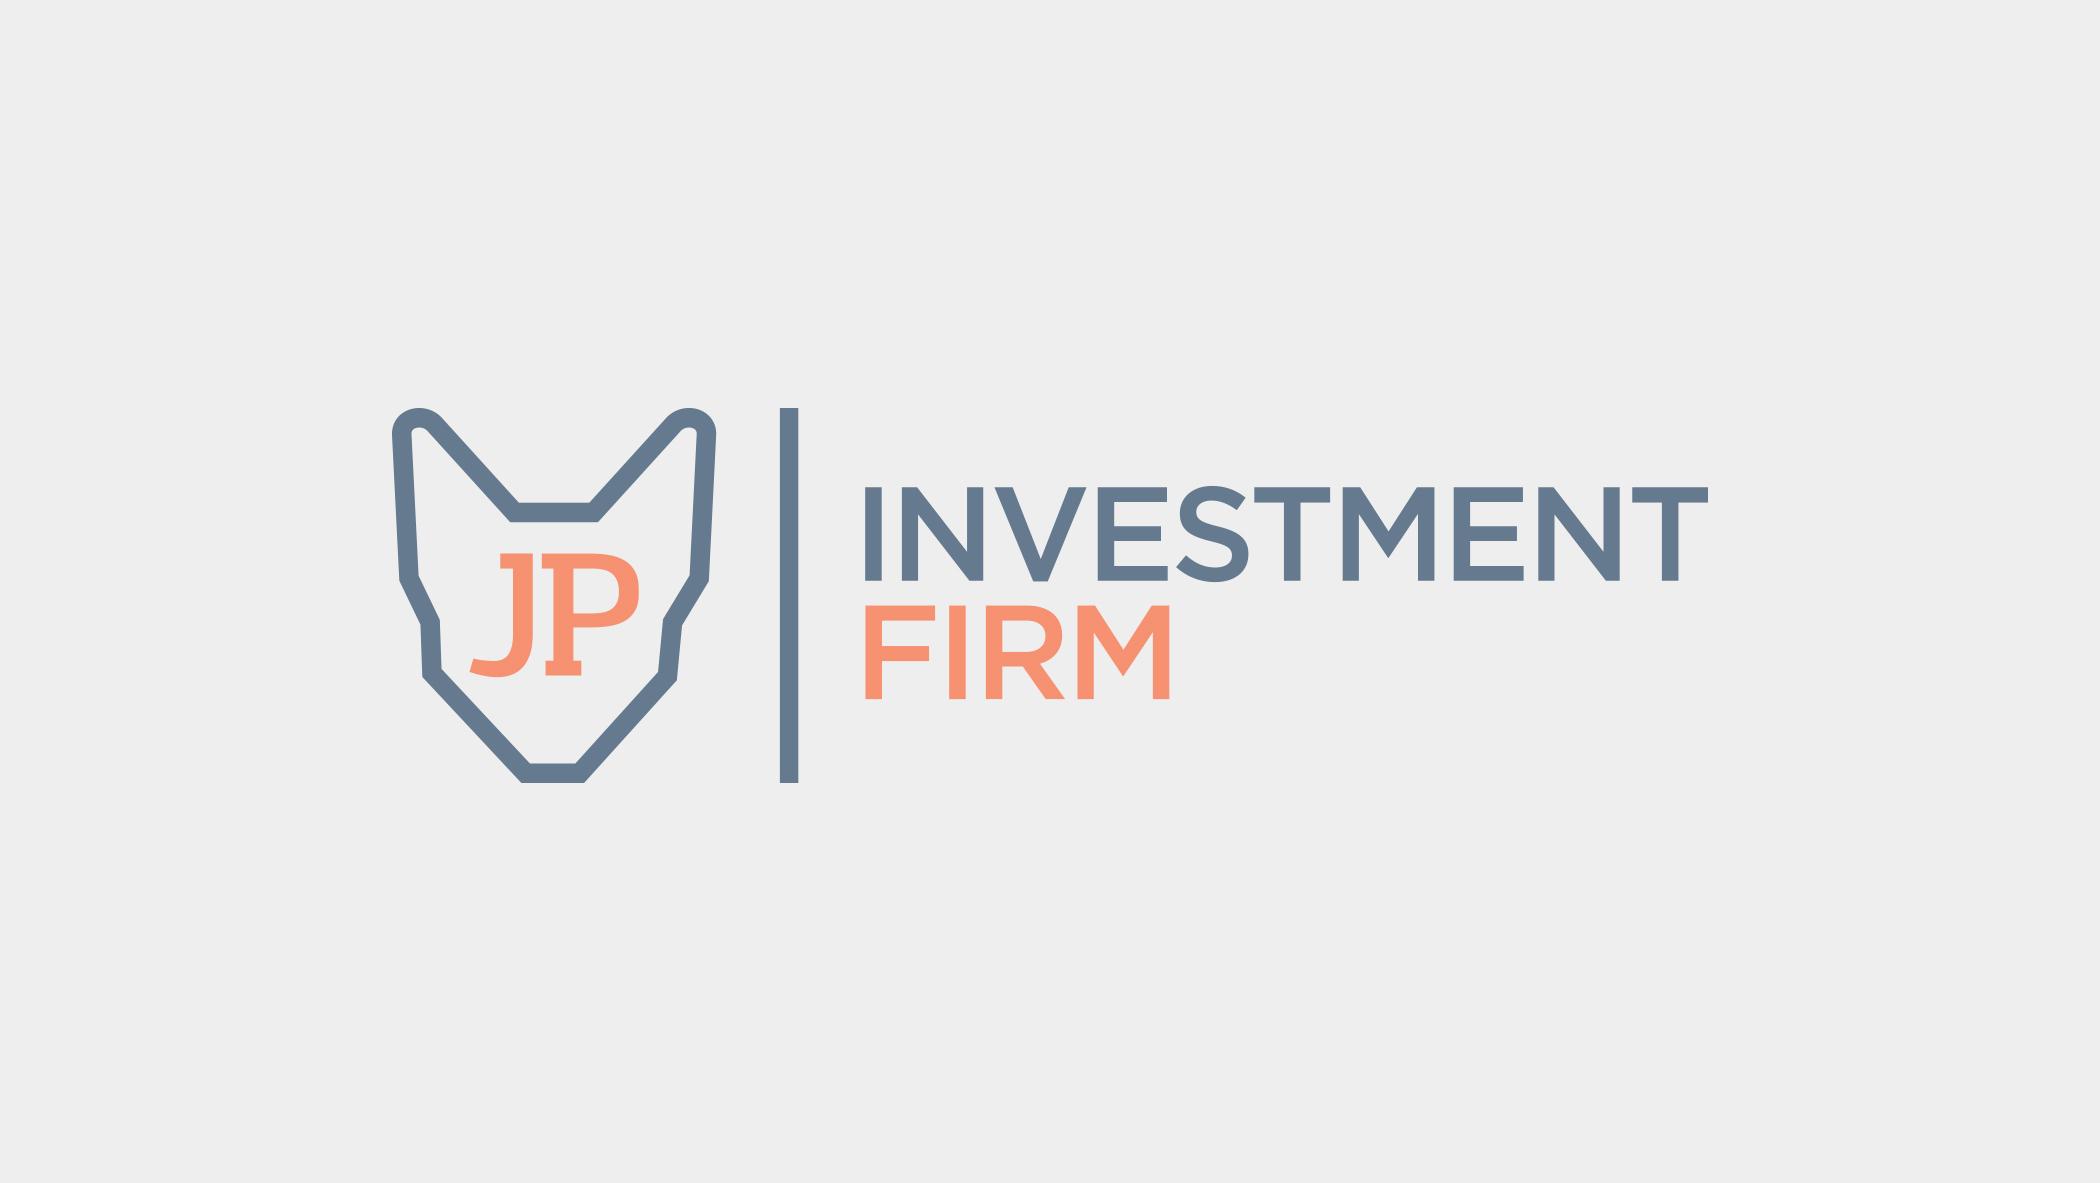 JPInvestmentFirm-Branding-LogoDesign-PeteDesignCompany-Lancaster